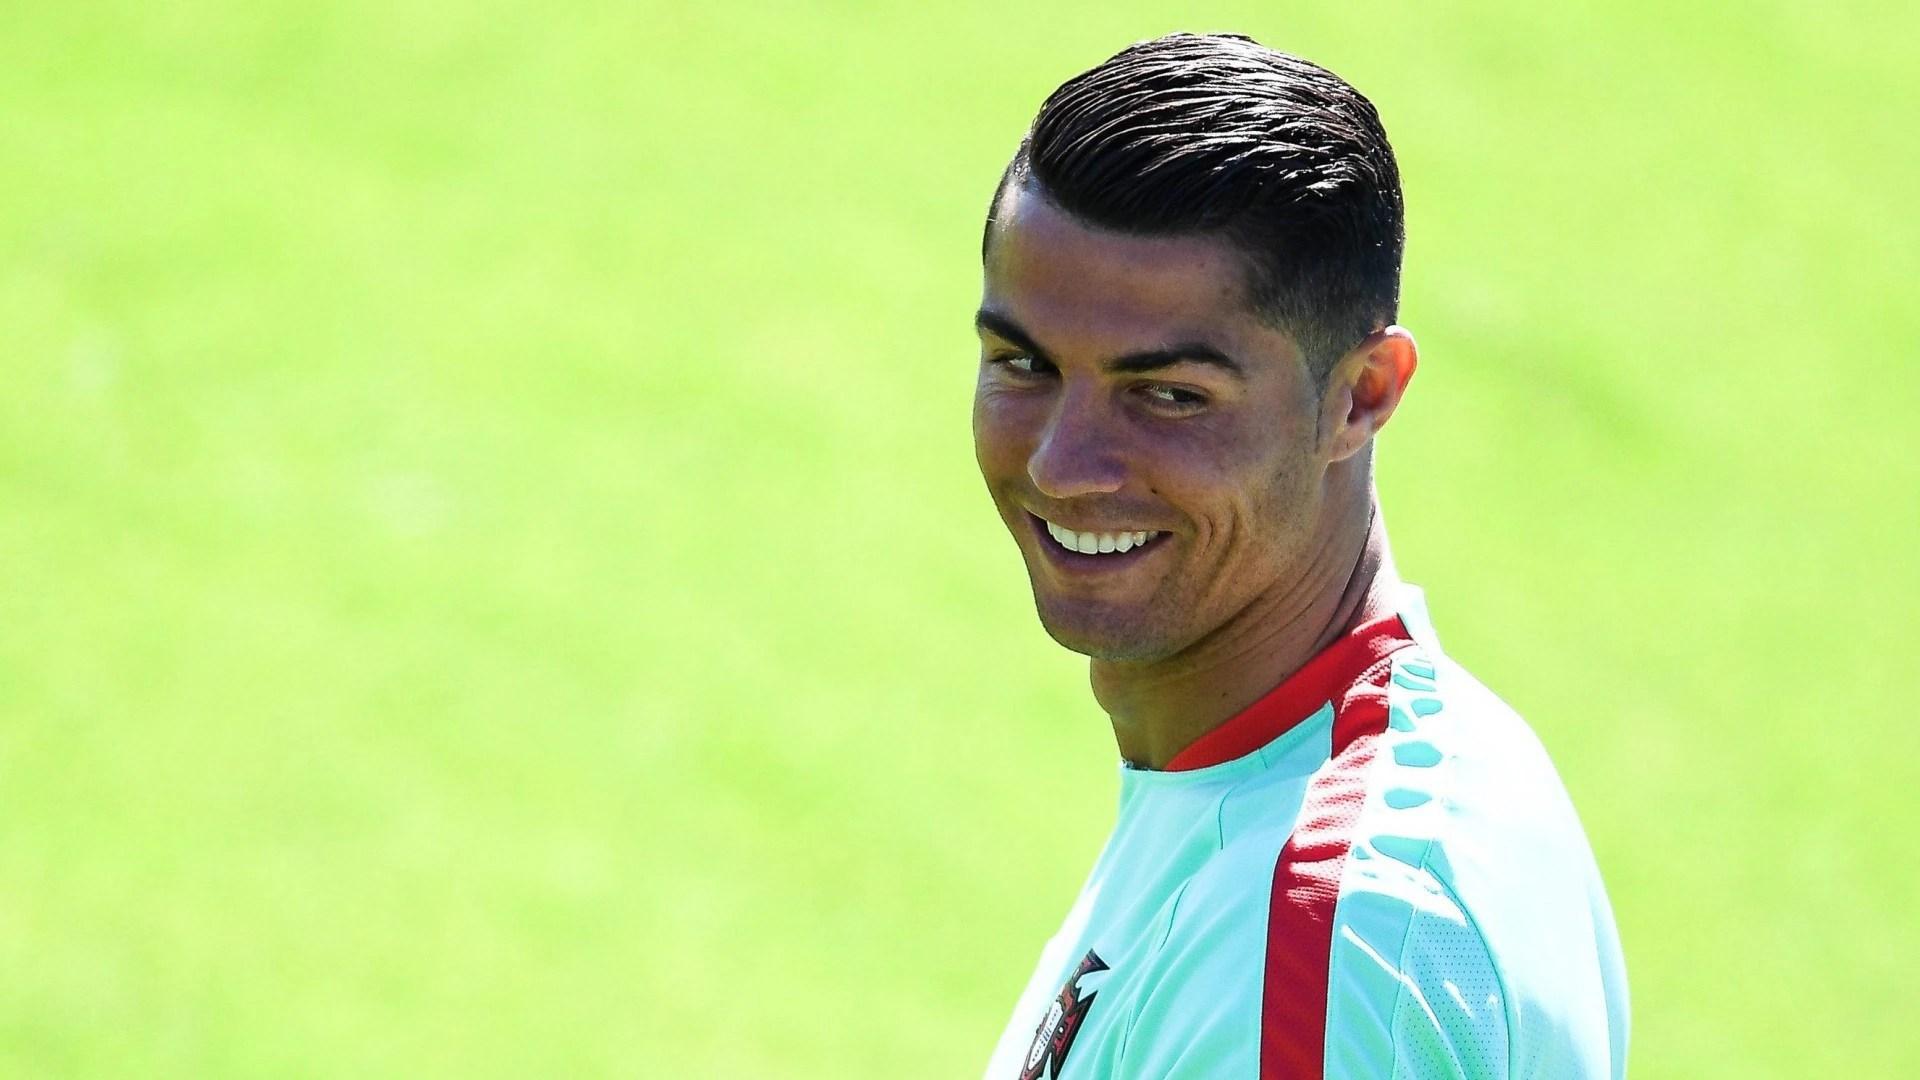 Streitfall Ronaldo! Warum Der Superstar So Polarisiert – B Z Berlin